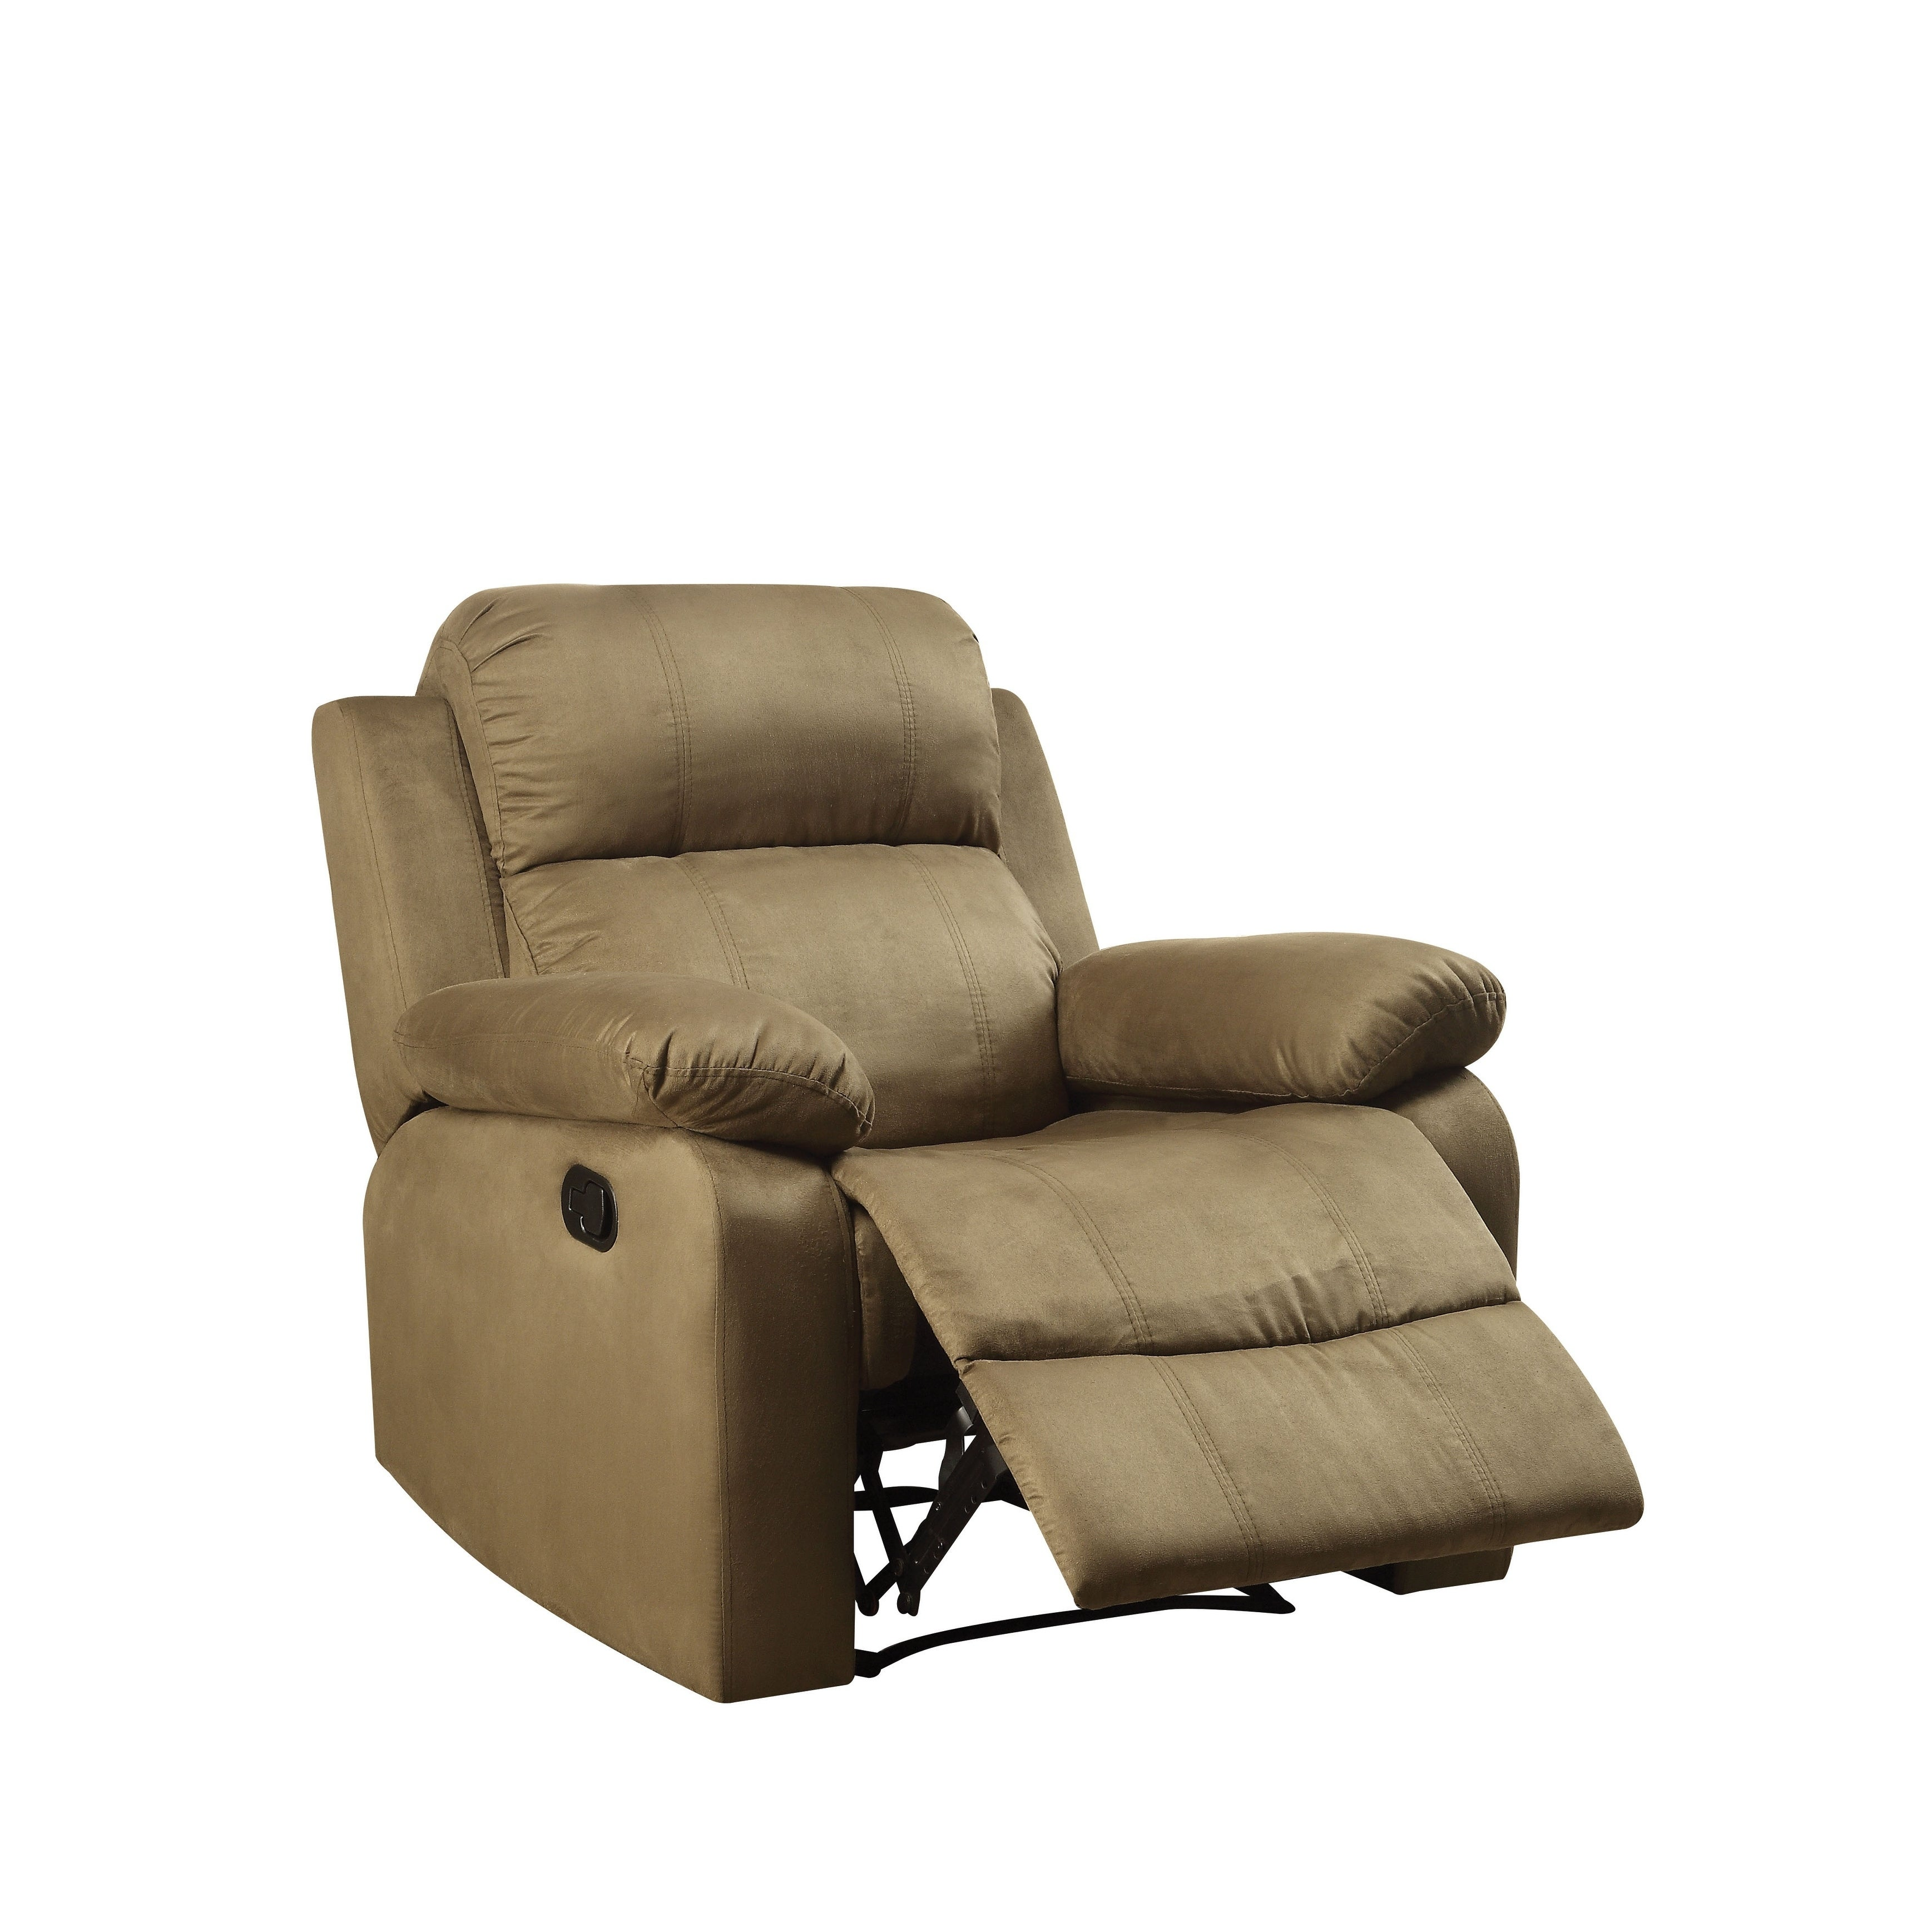 Shop Acme Furniture Parklon Olive Microfiber Recliner - Free ...